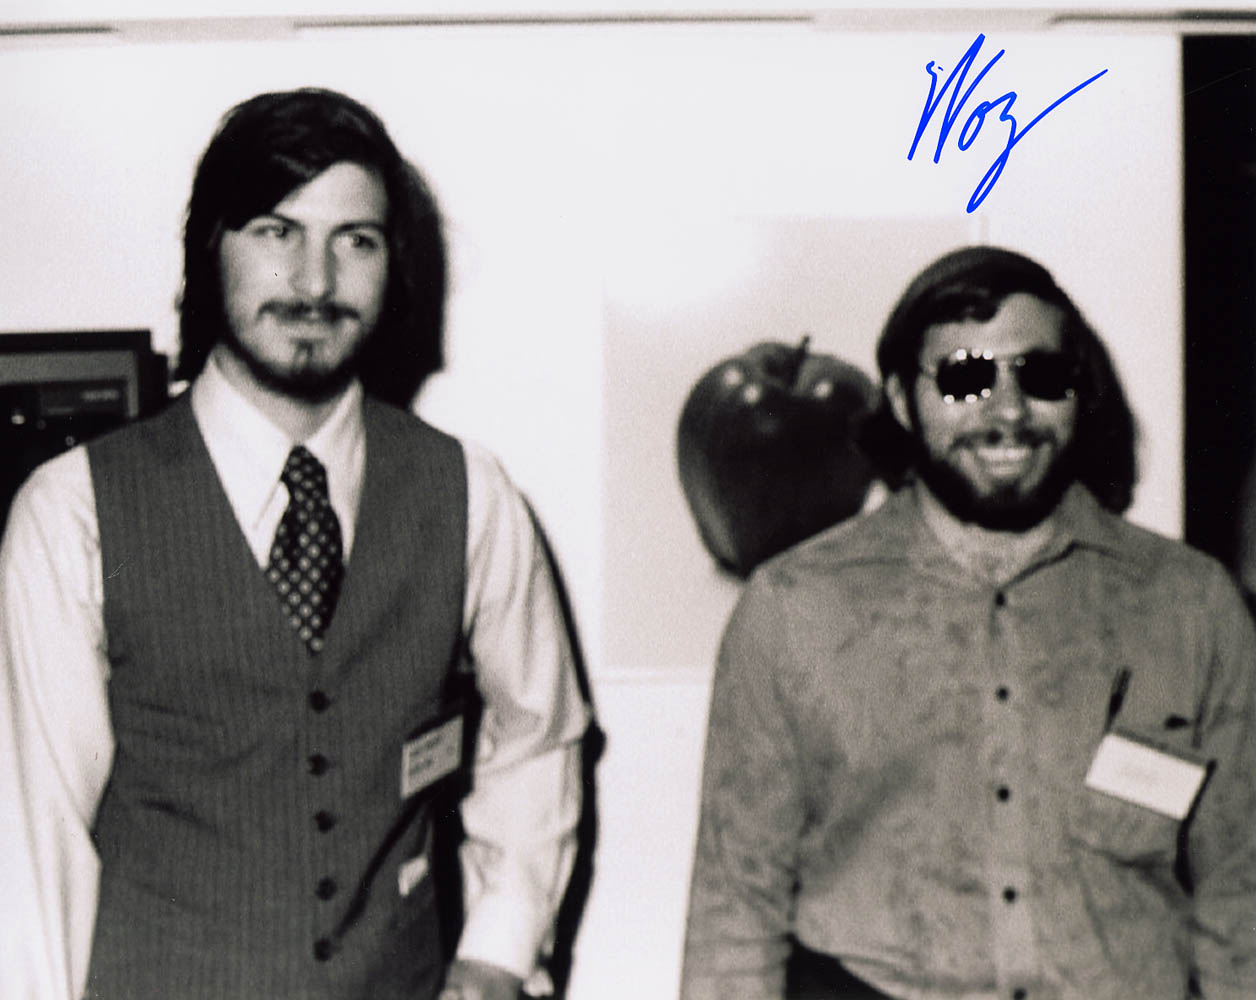 Steve Jobs and Steve Wozniak 10 x 8 Signed Photo